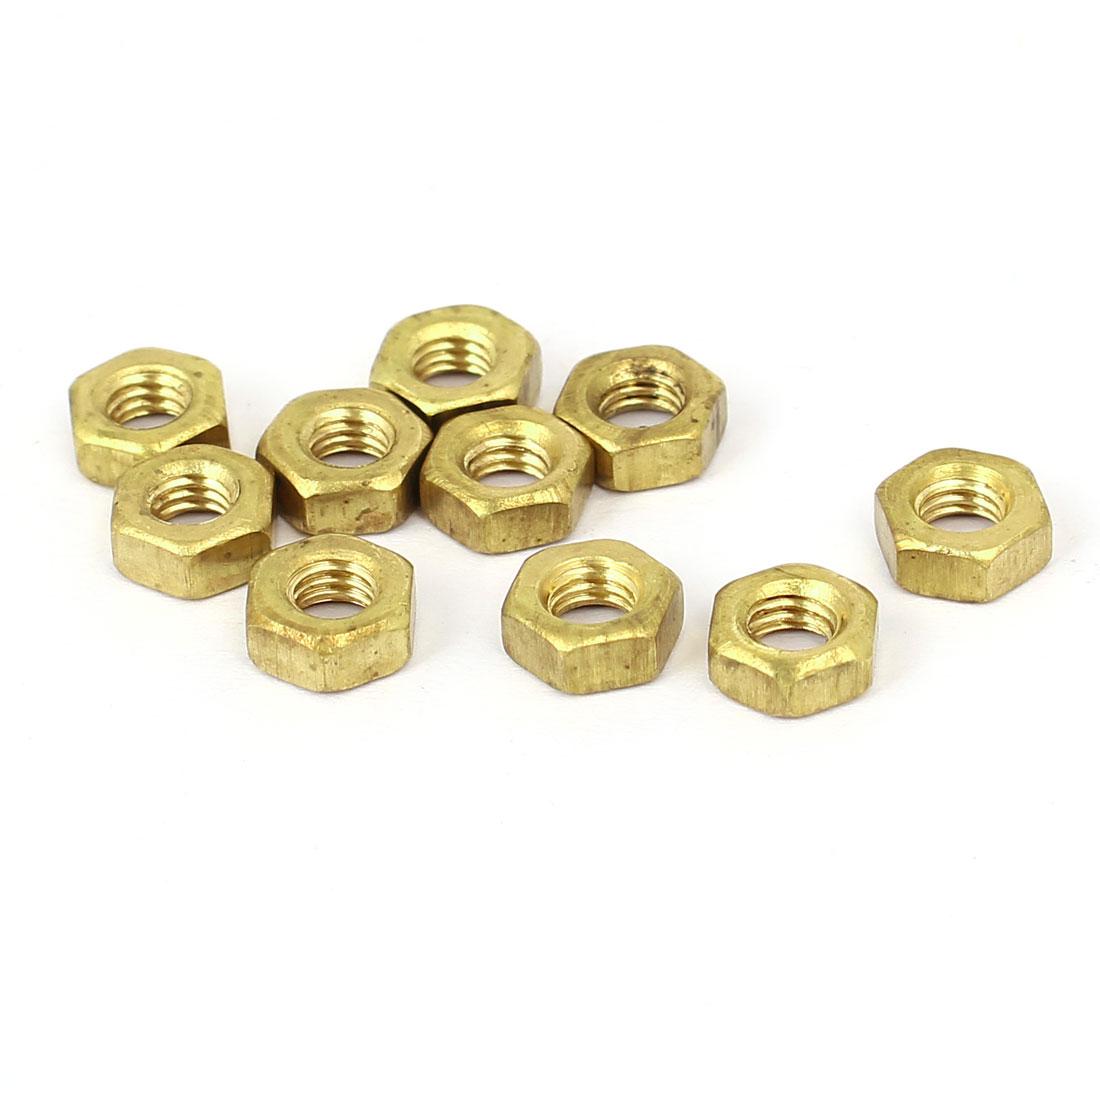 M4 Brass Finished Metric Hex Nut Fastener Brass Tone 10pcs